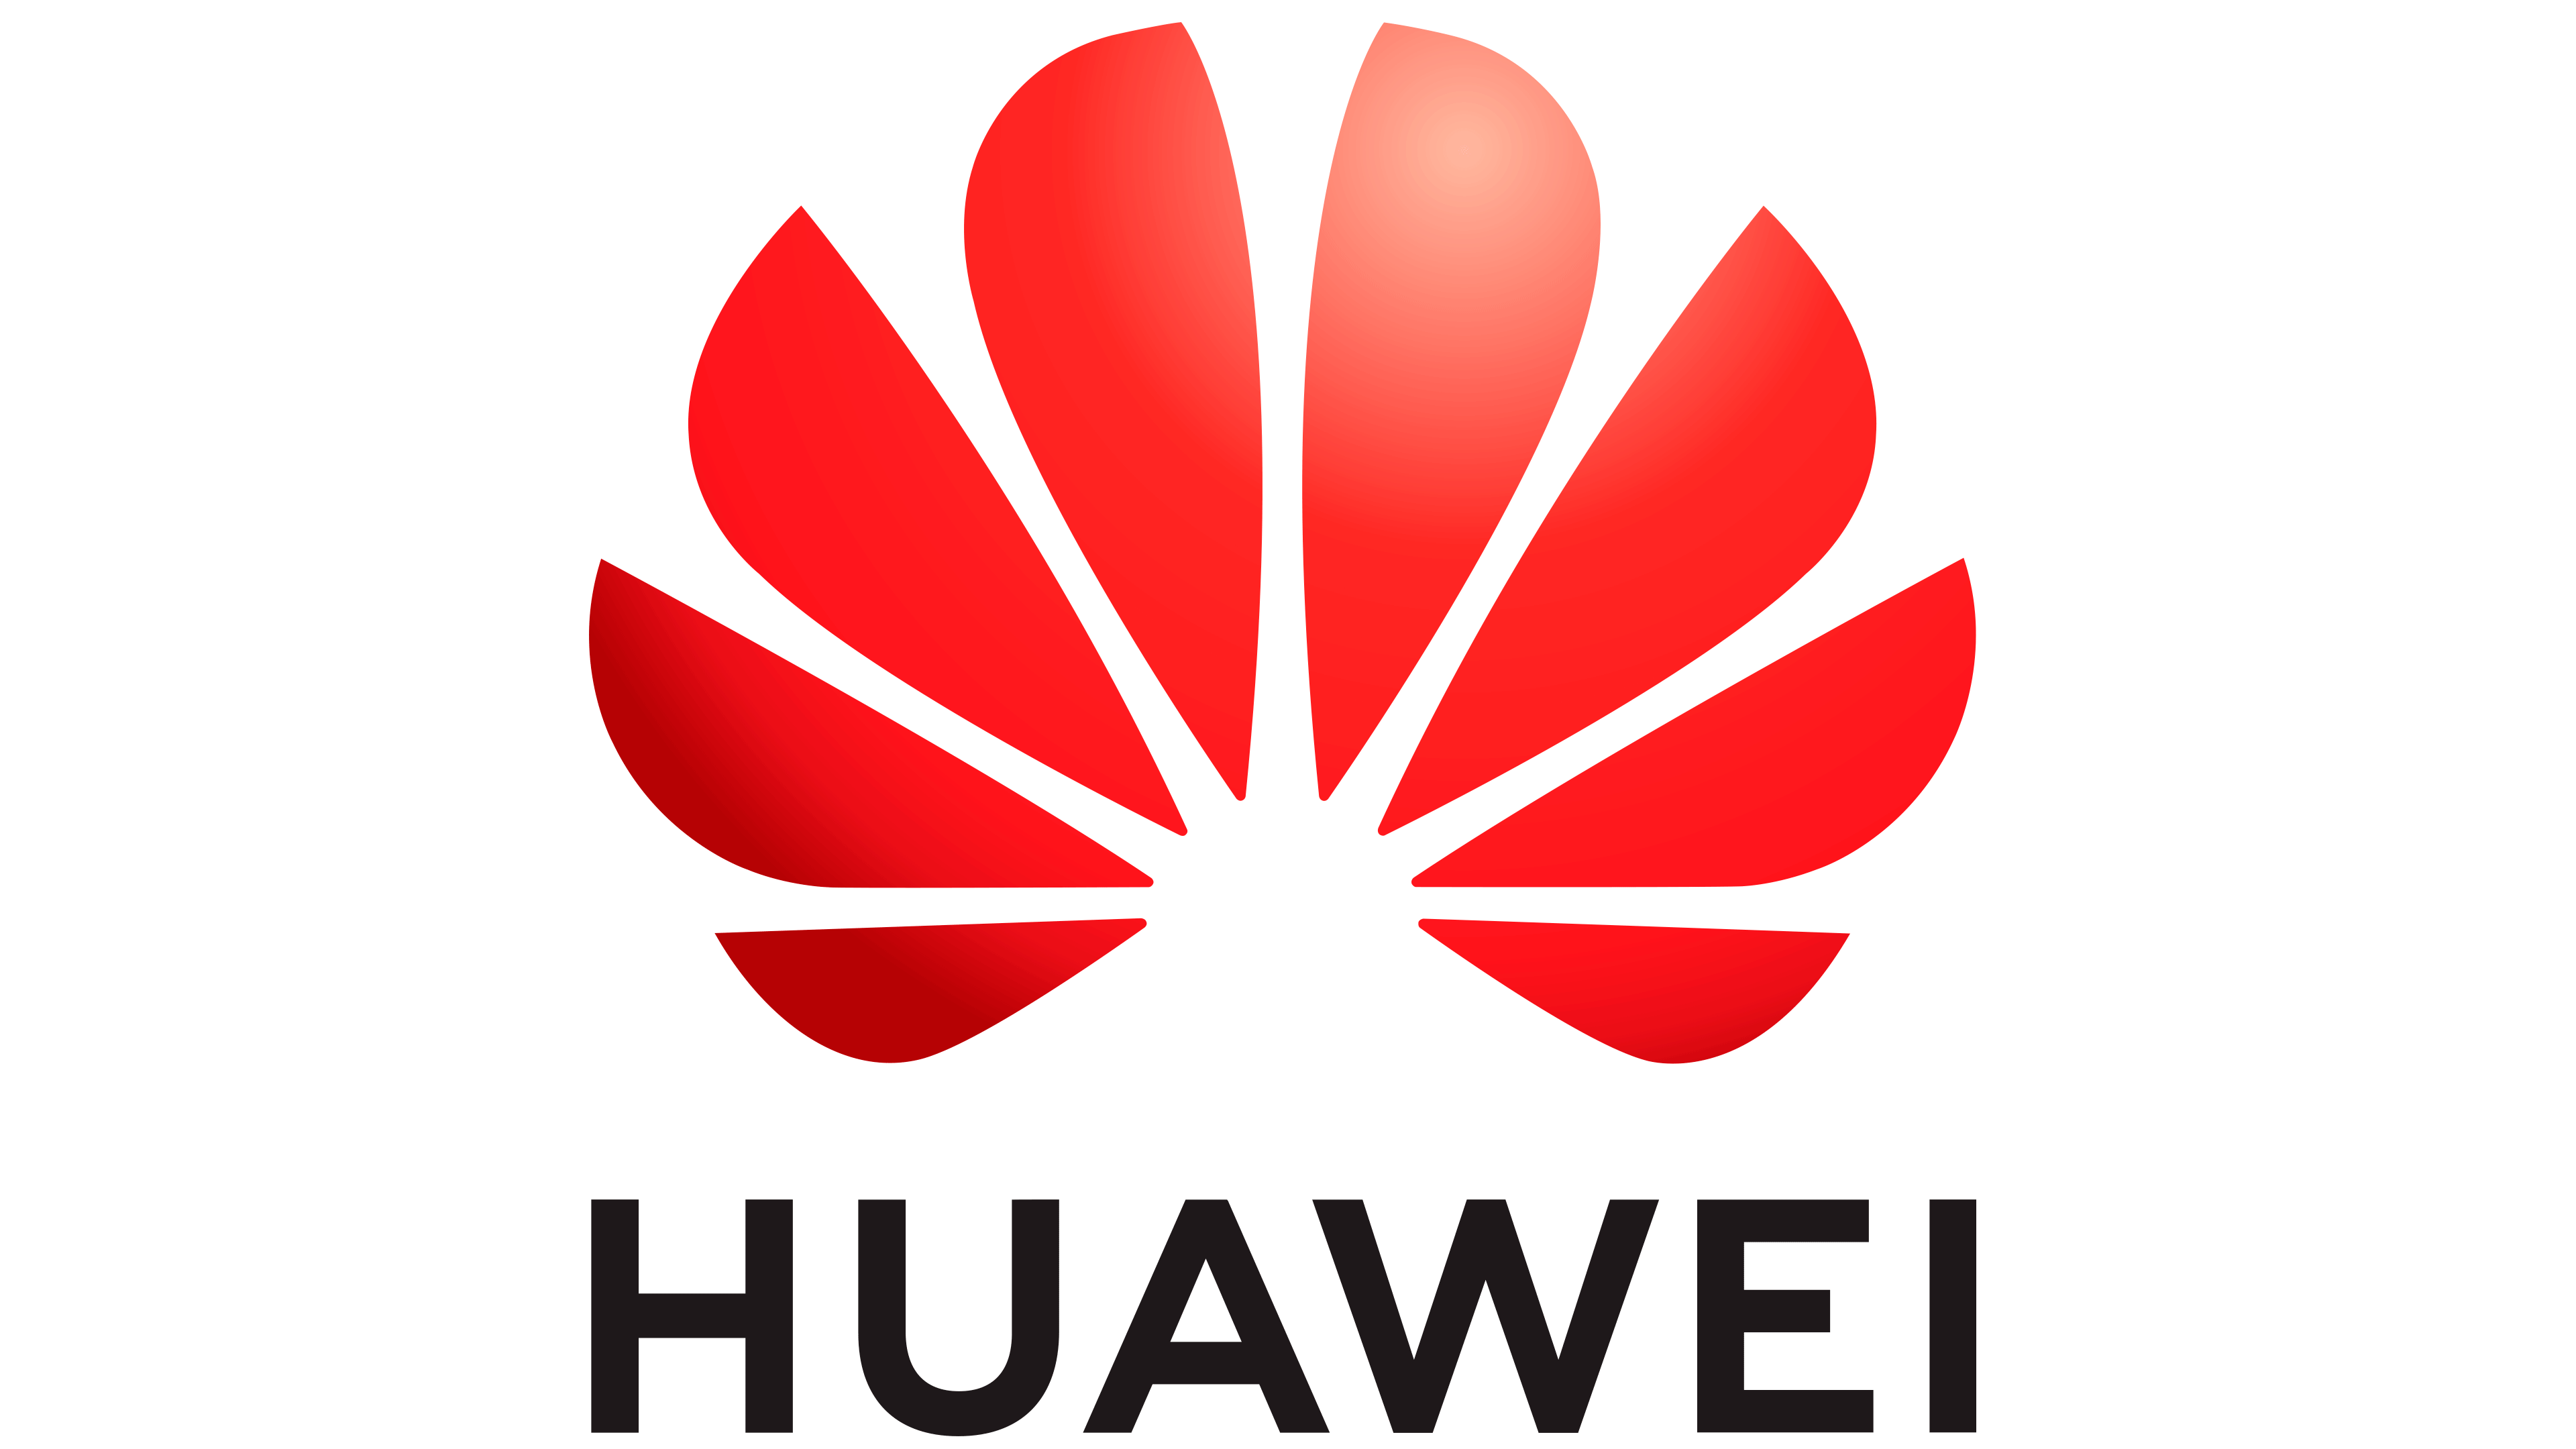 Télécharger photo huawei logo png